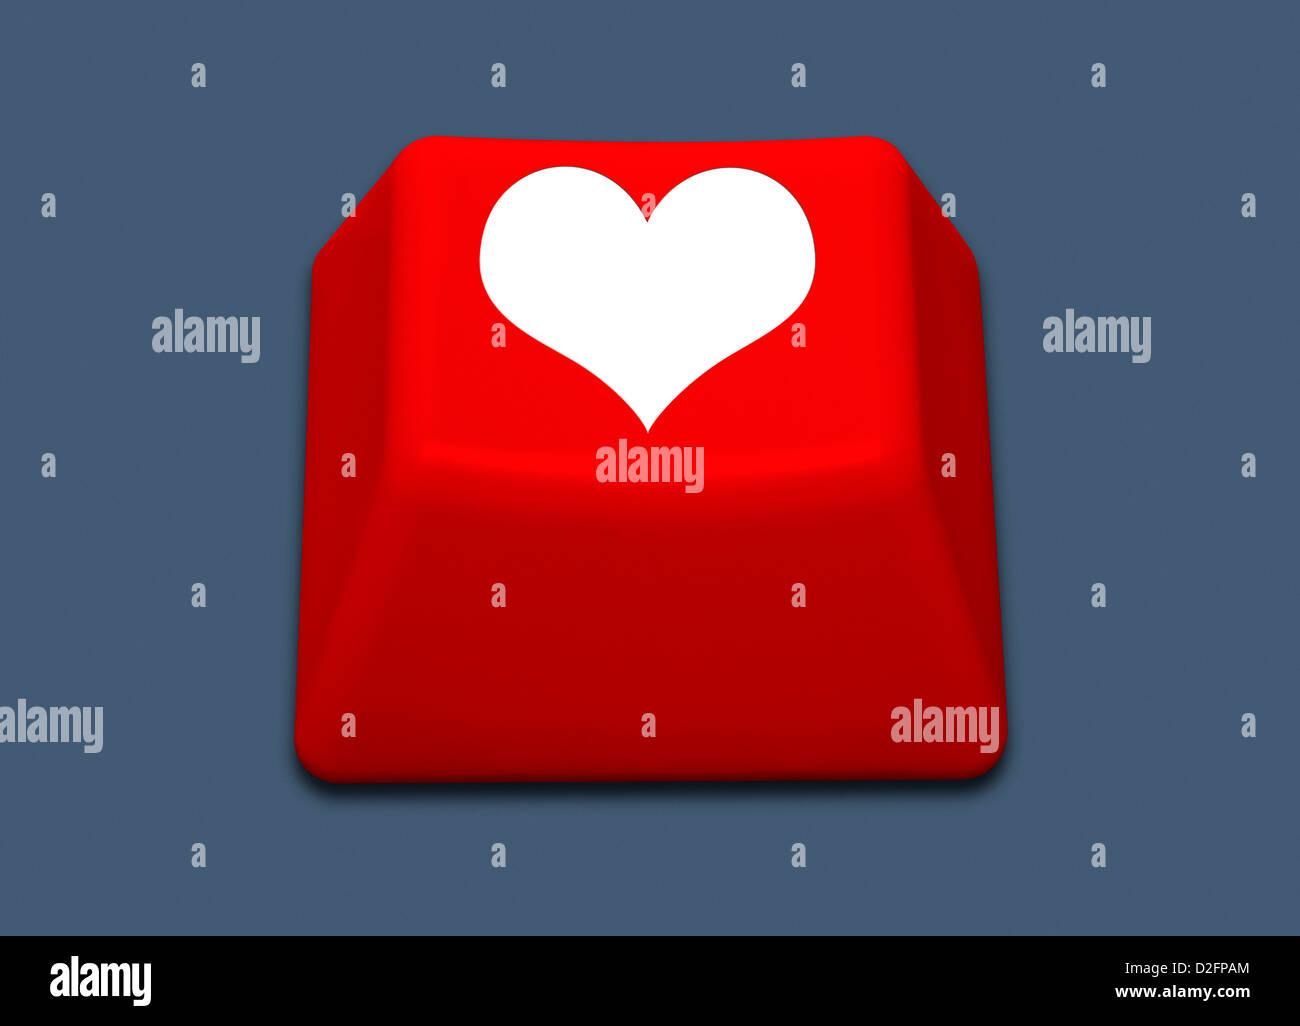 Internet online dating / amor online / social media concept Imagen De Stock